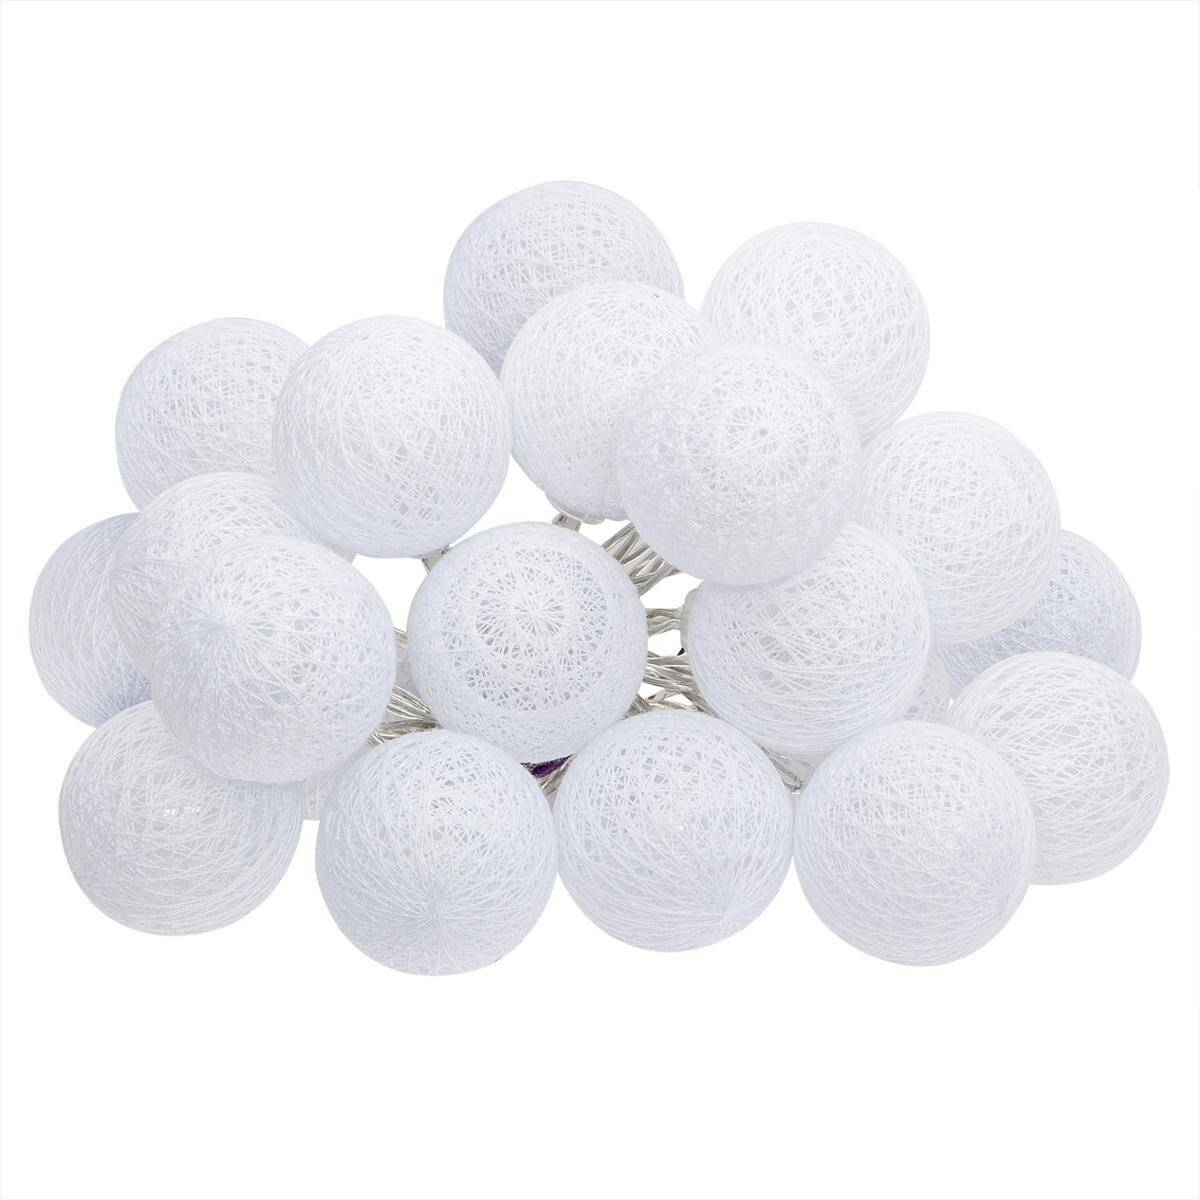 Atmosphera Guirlande LED 20 boules, blanc L435 cm